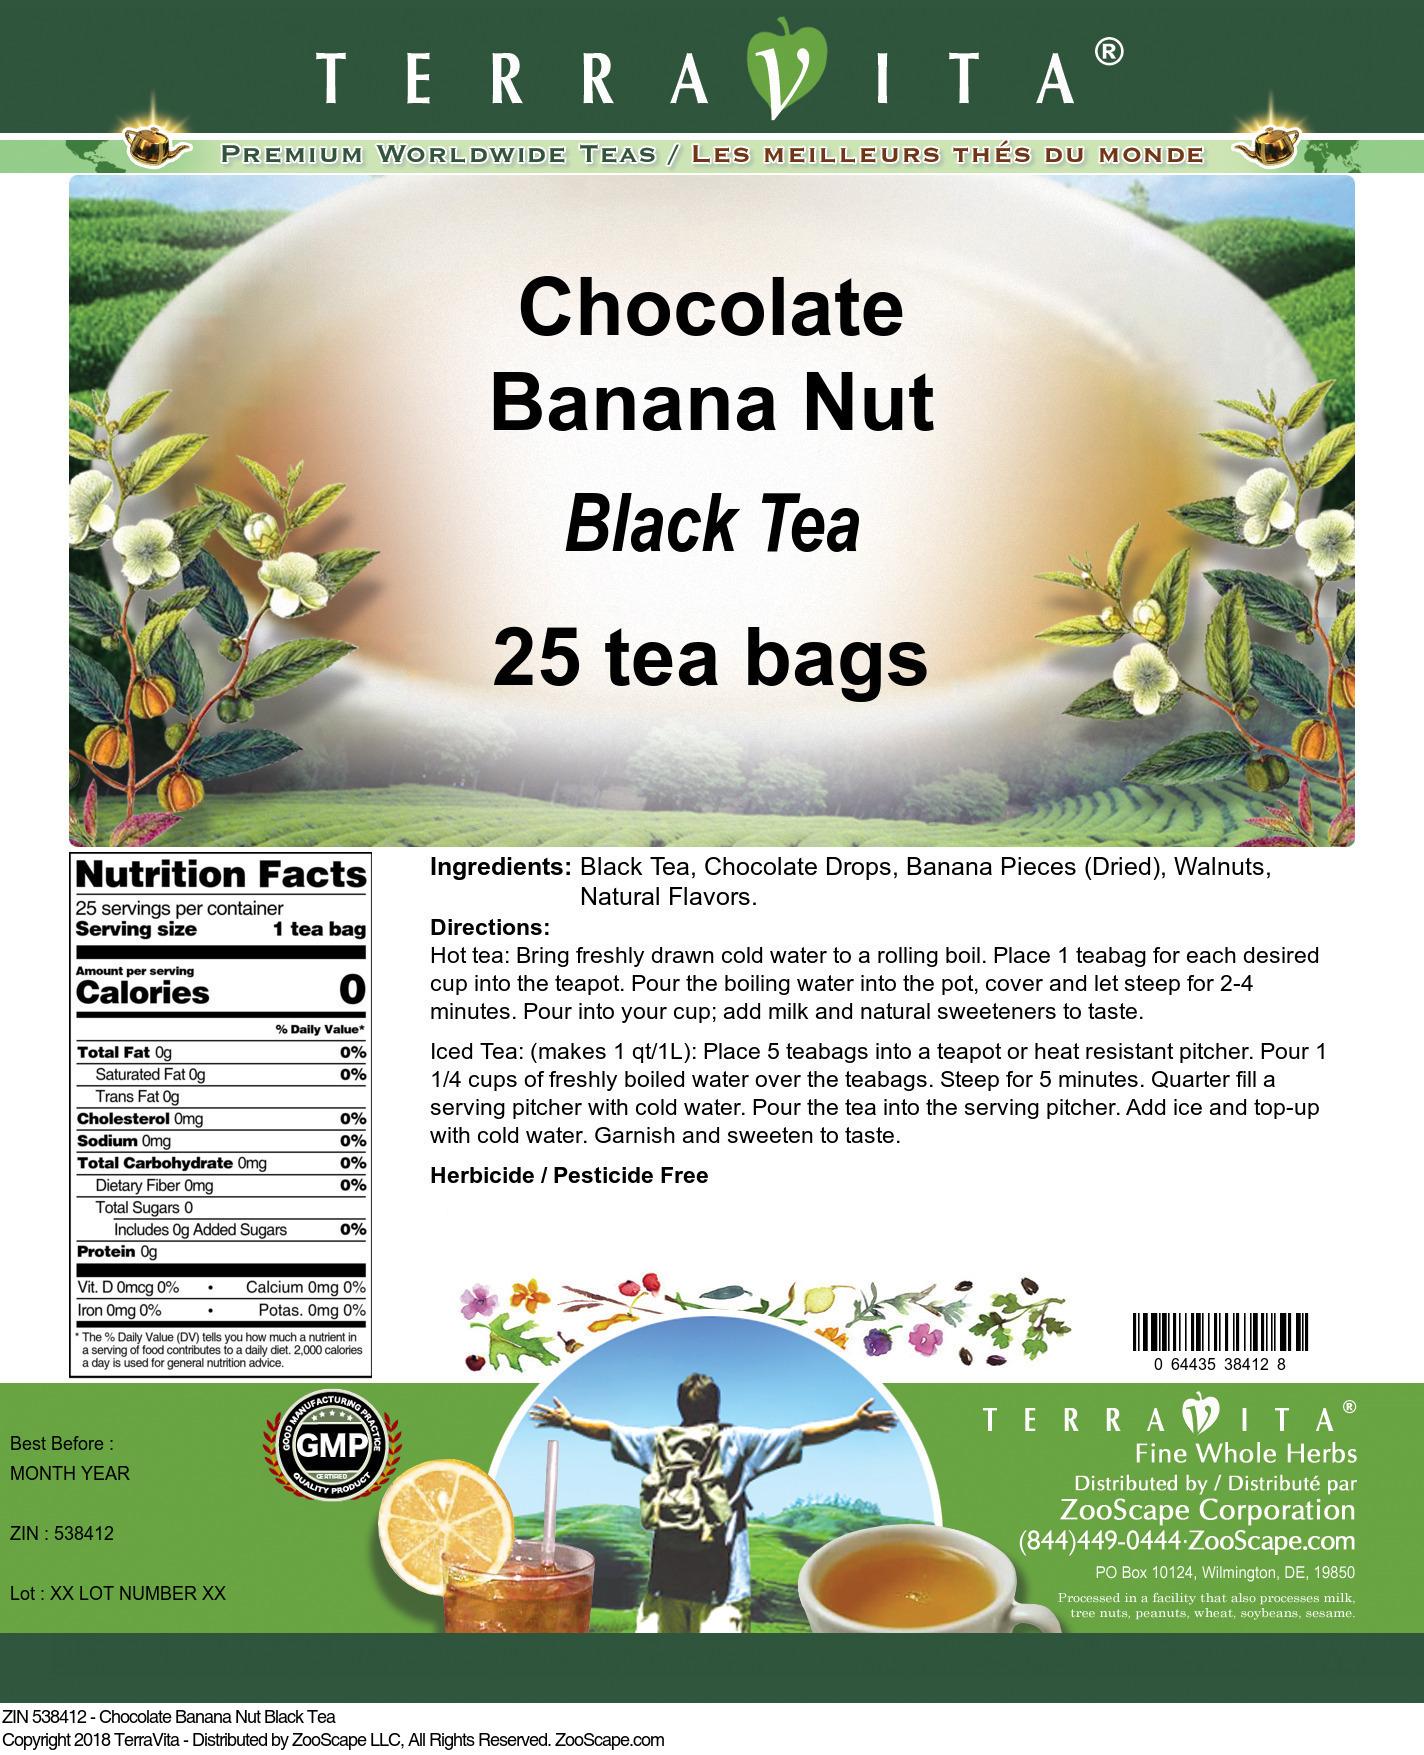 Chocolate Banana Nut Black Tea